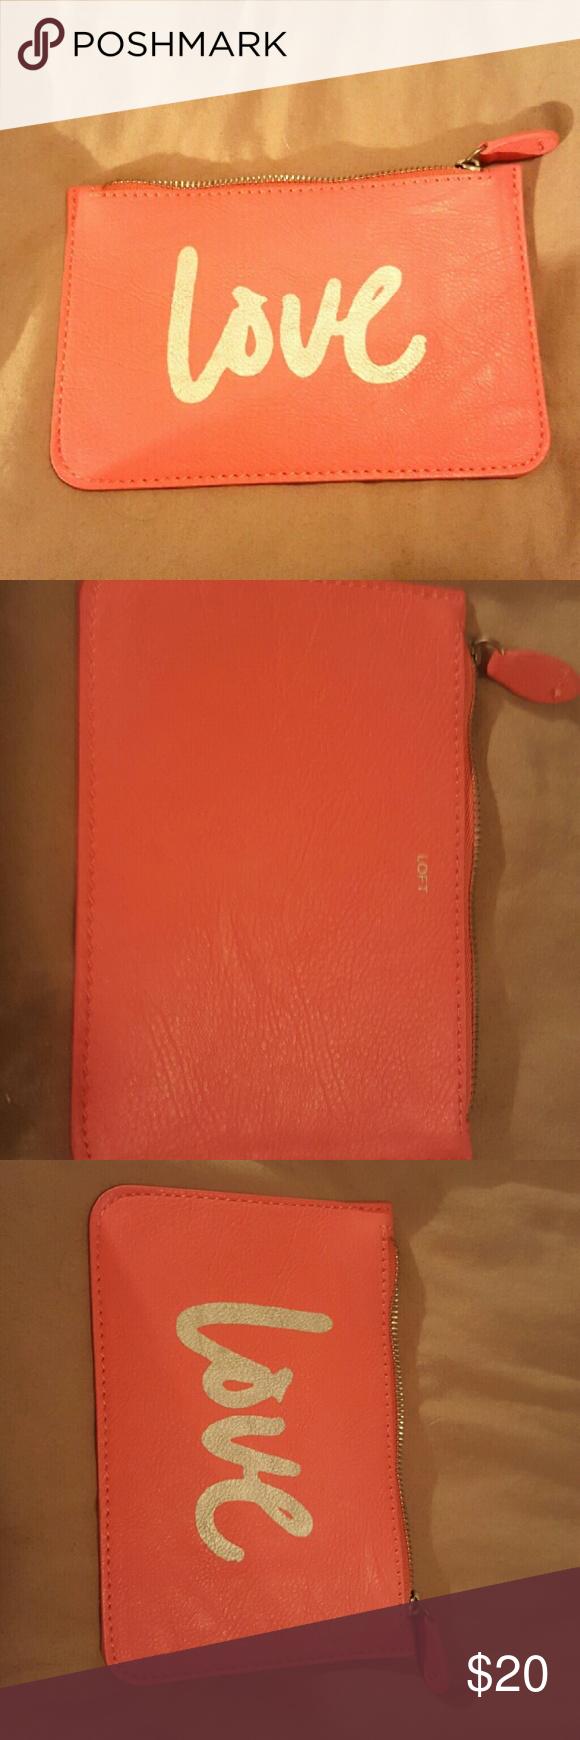 Orange Loft Love Card Holder Or Makeup Case Brand New Never Used Roughly 4x6 Offers Welcomed Loft Accessories Key Makeup Case Love Cards Key Card Holder